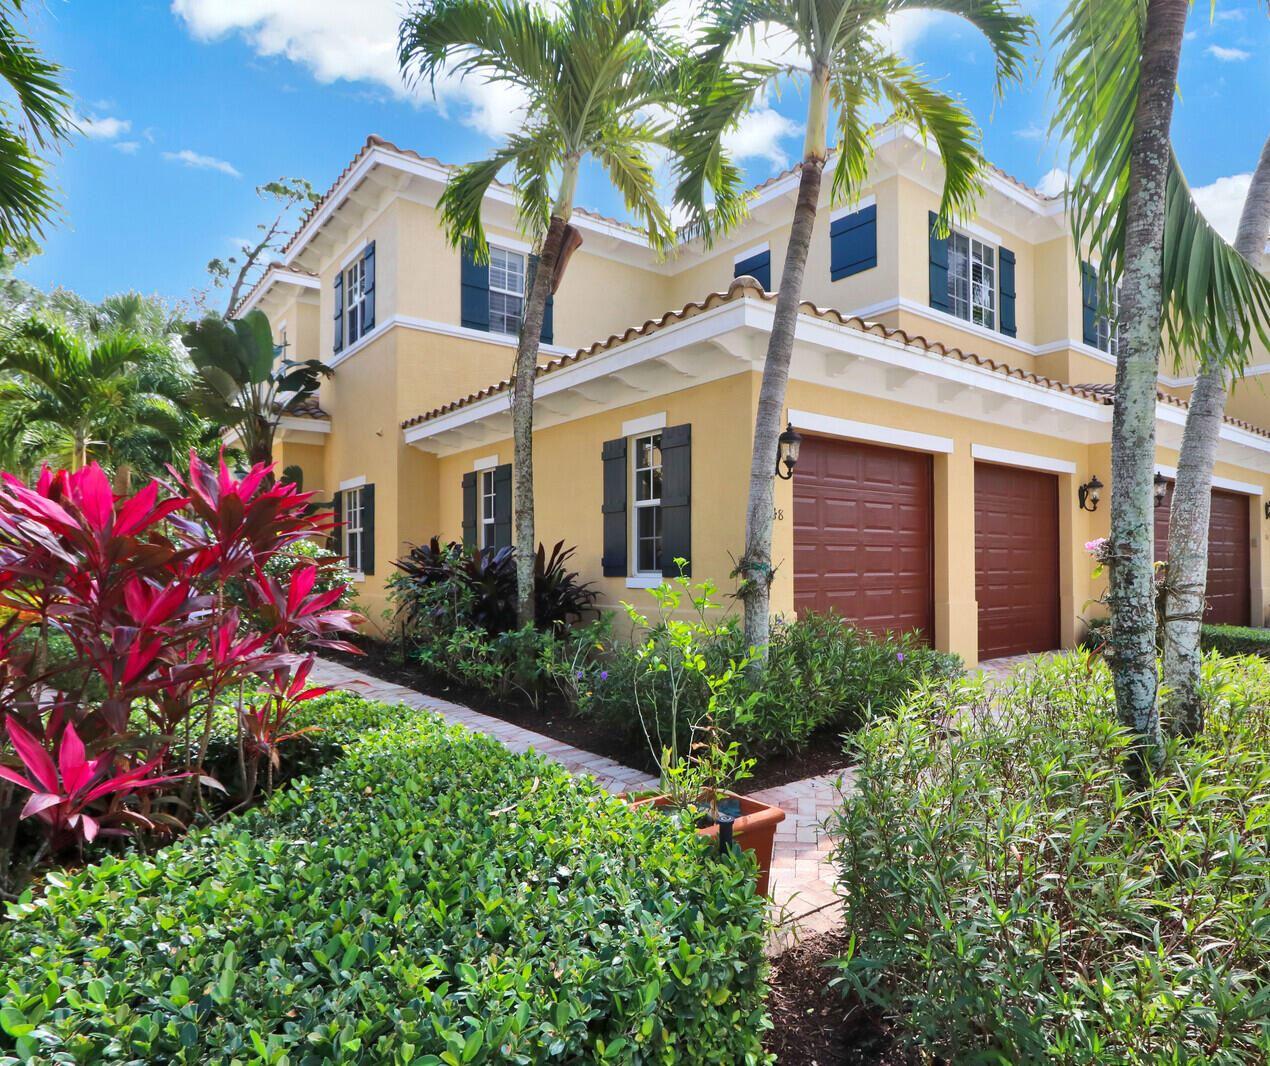 Photo of 348 Chambord Terrace #348, Palm Beach Gardens, FL 33410 (MLS # RX-10695460)